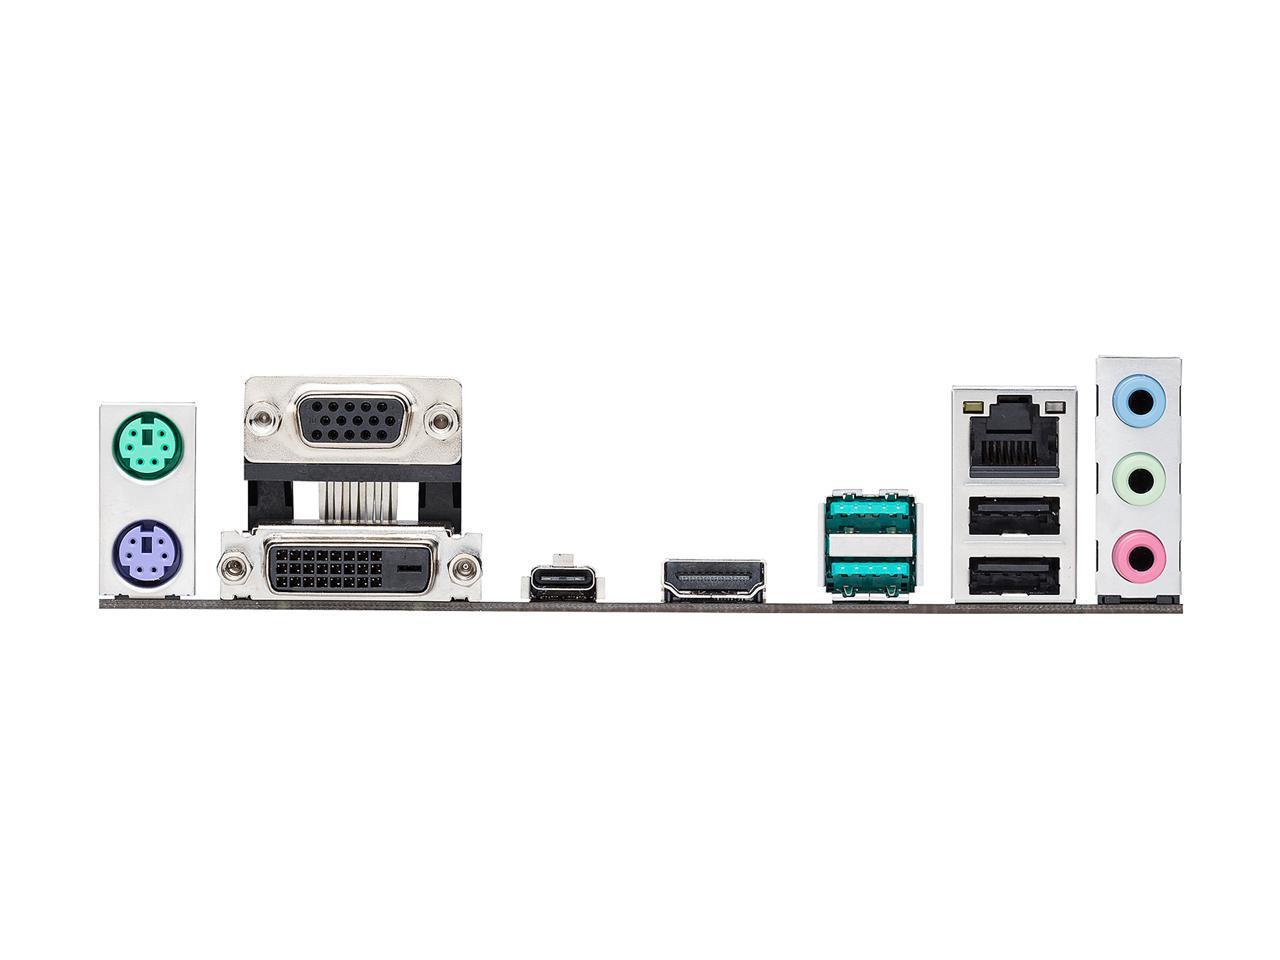 ASUS PRIME B360M-A LGA1151 (300 Series) DDR4 HDMI DVI VGA